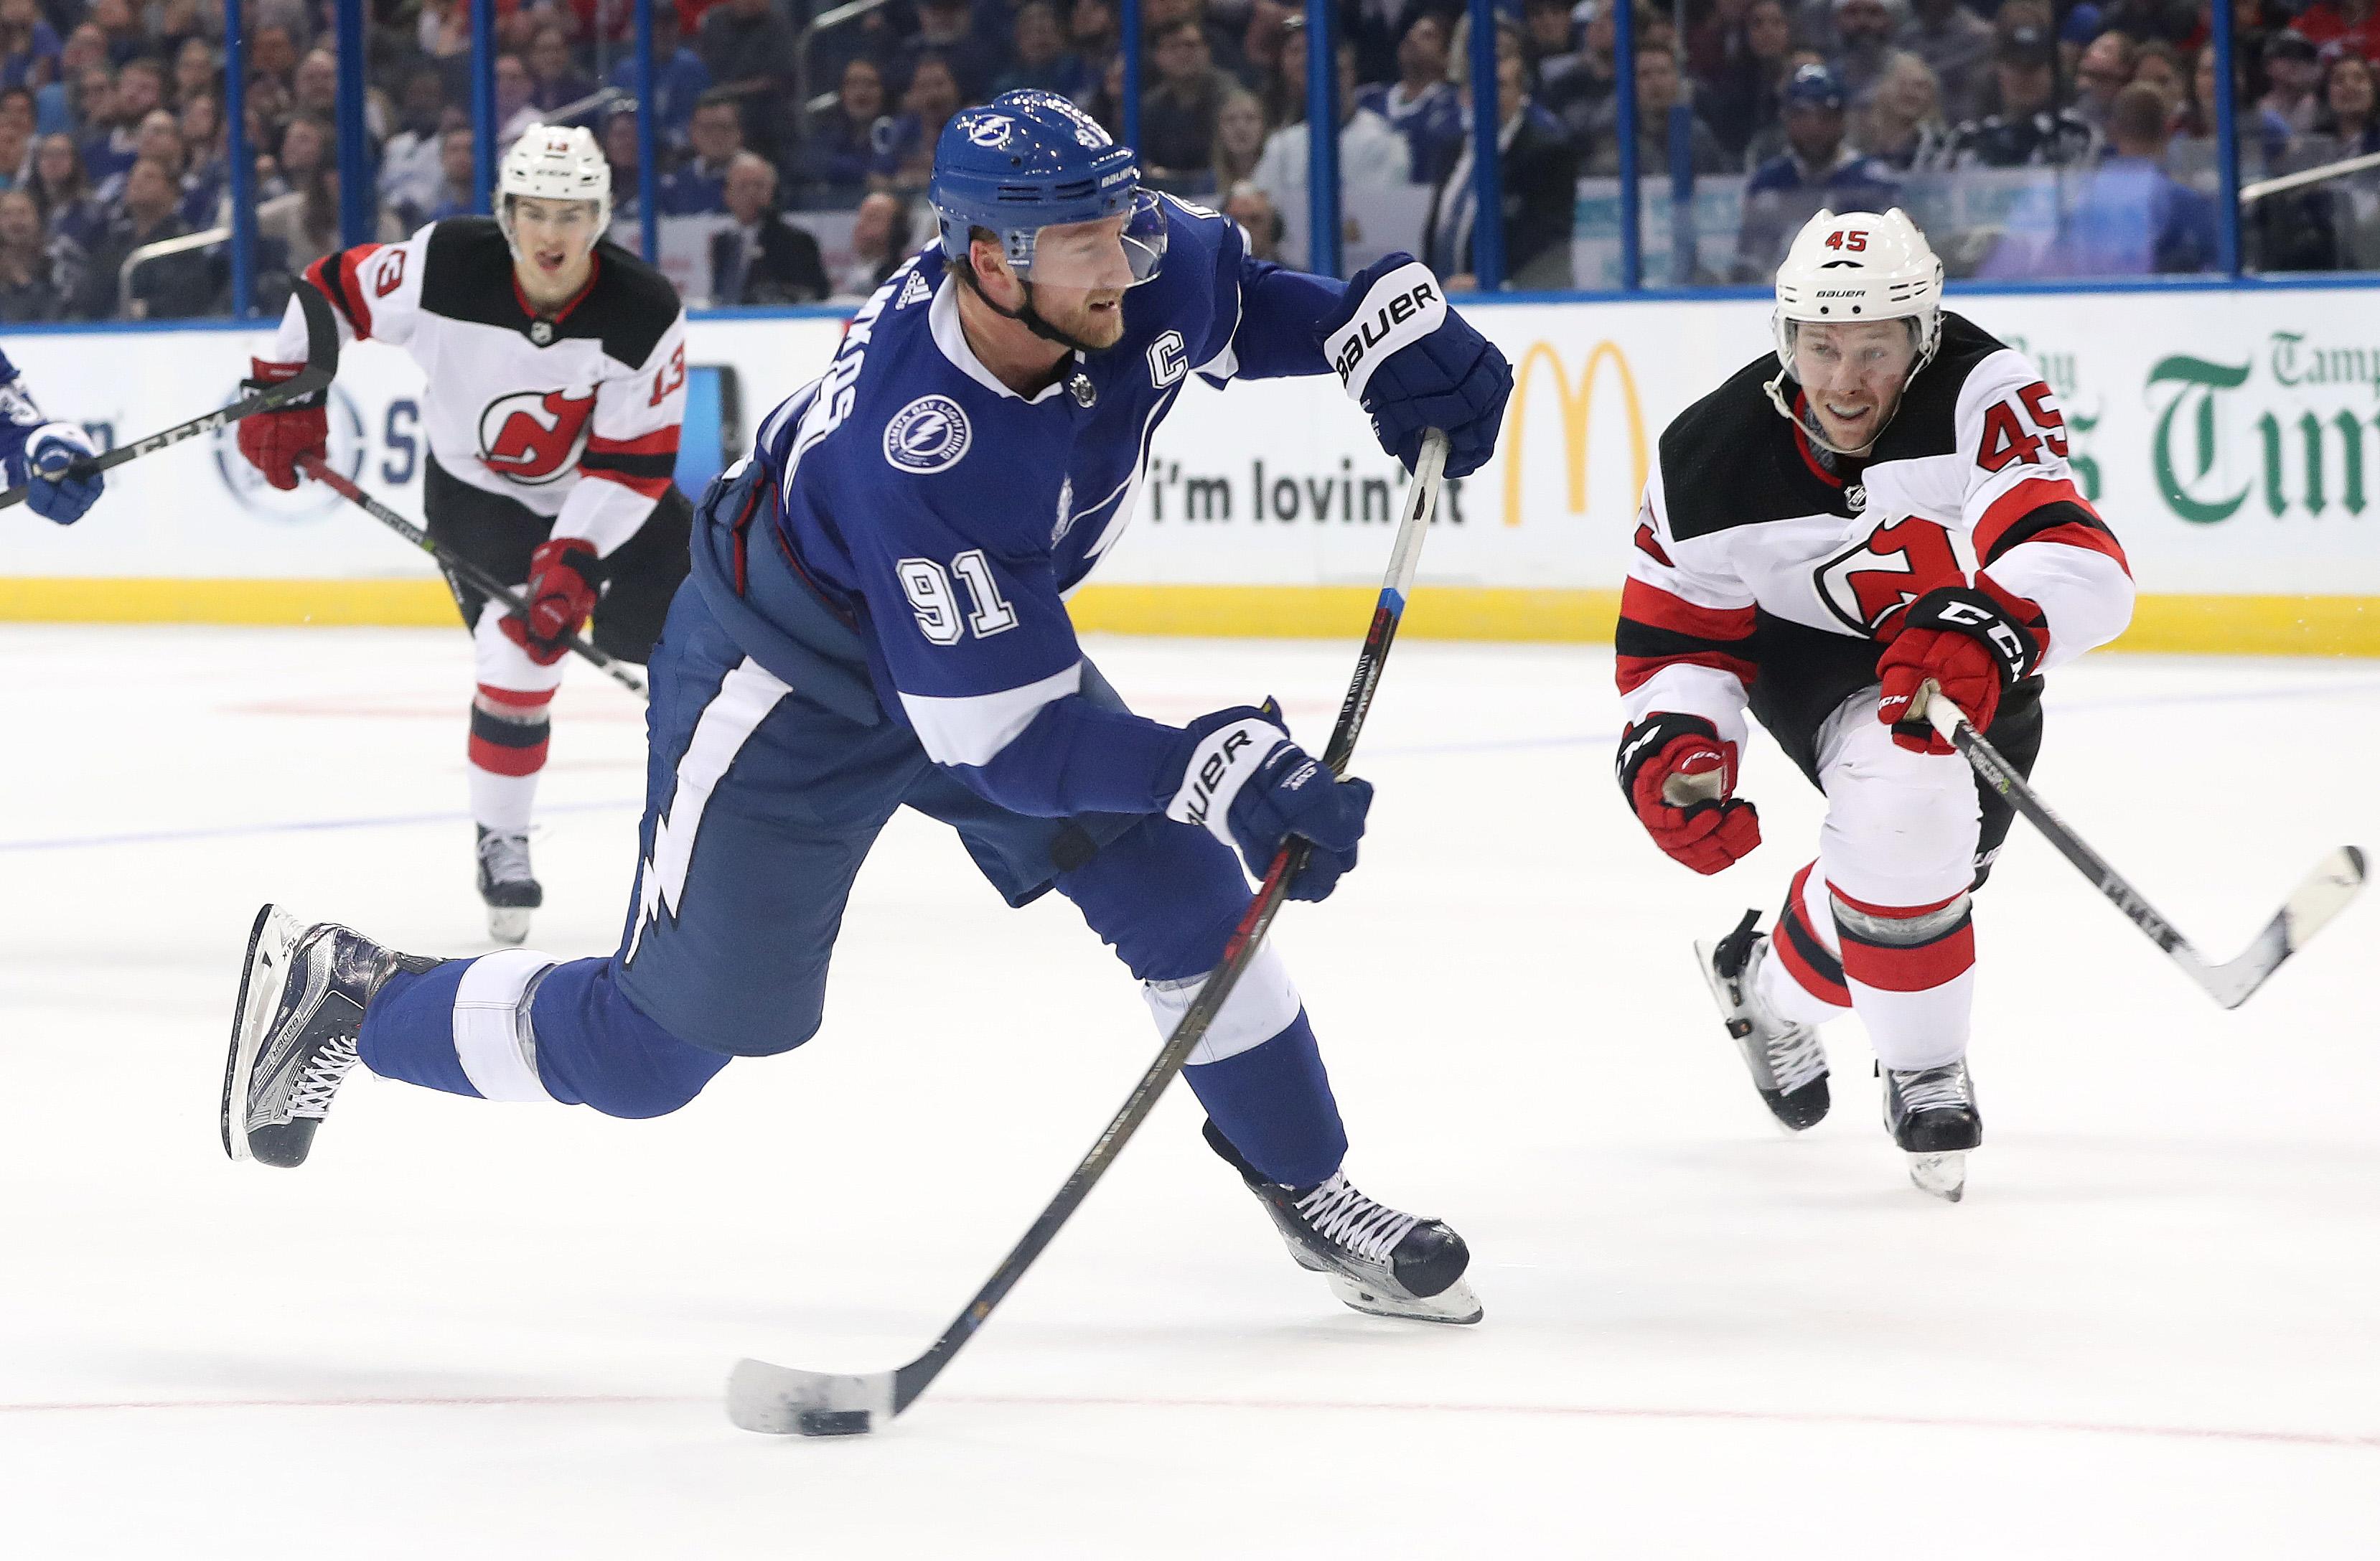 NHL: New Jersey Devils at Tampa Bay Lightning